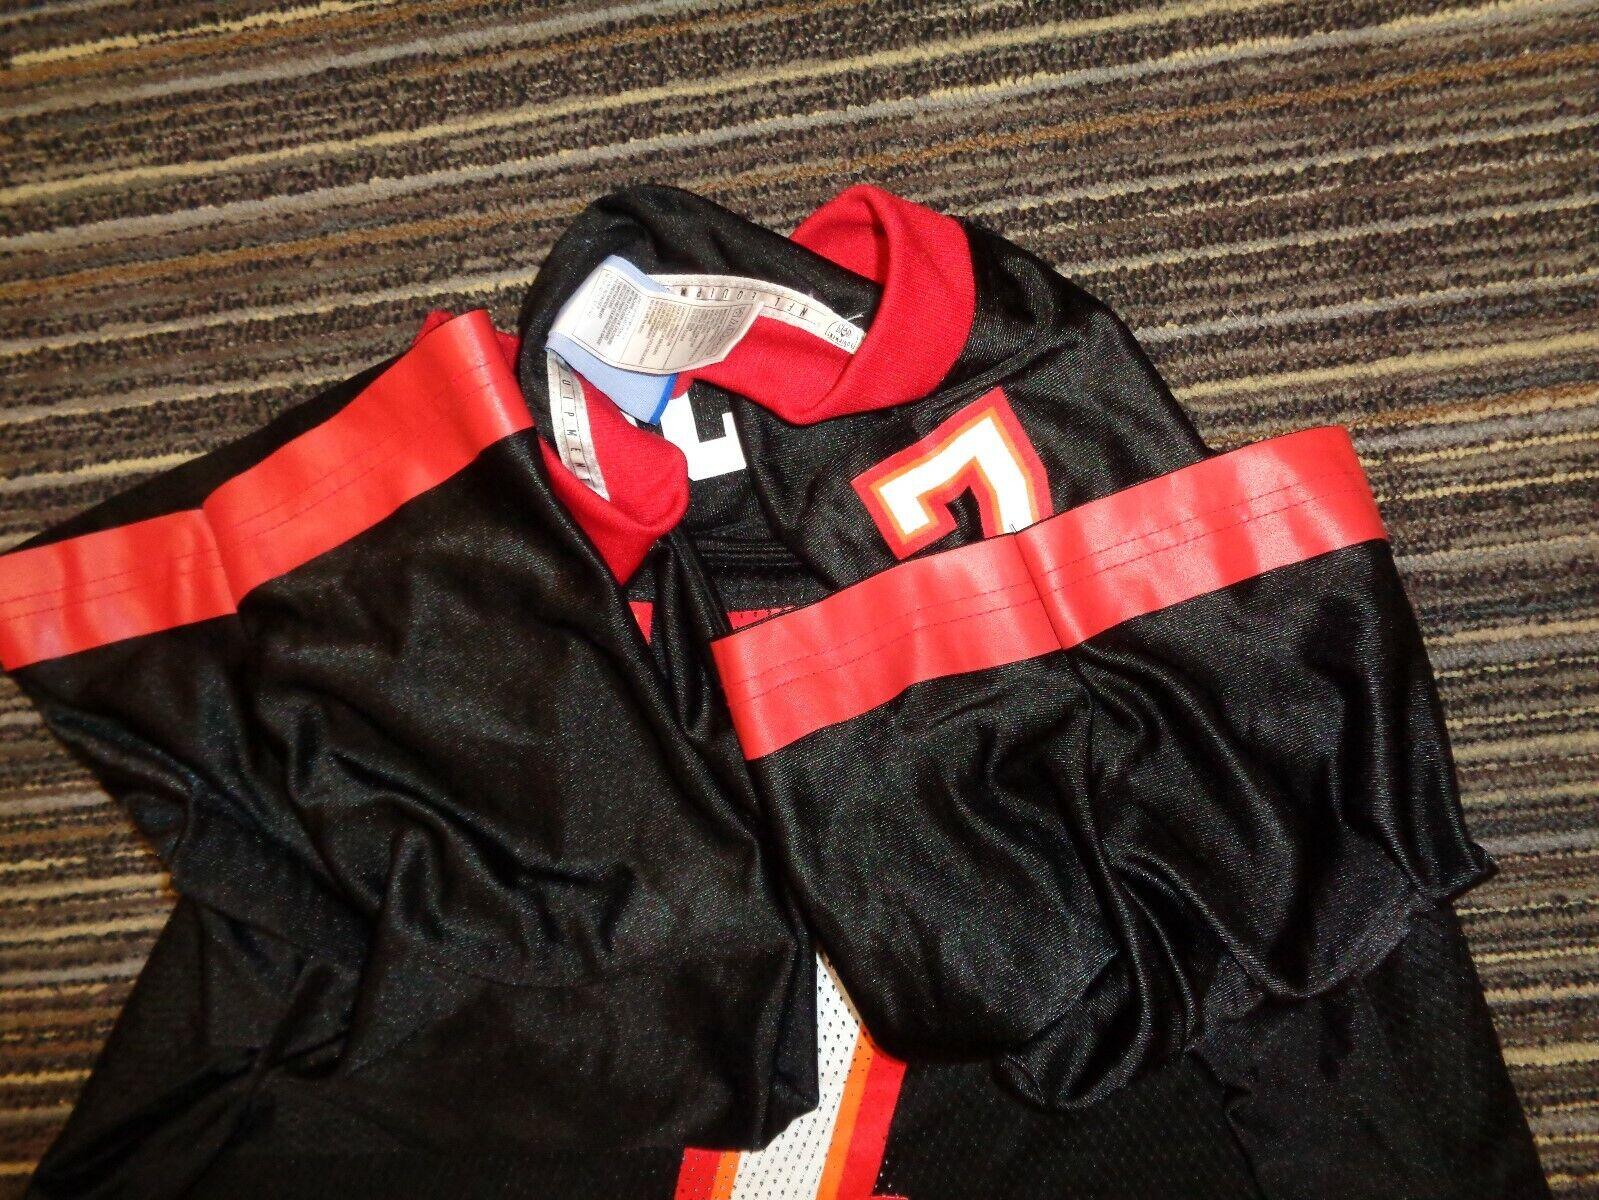 JEFF GARCIA 7 TAMPA BAY BUCCANEERS REEBOK BLACK NFL CFL GAME FOOTBALL JERSEY XL - $49.99